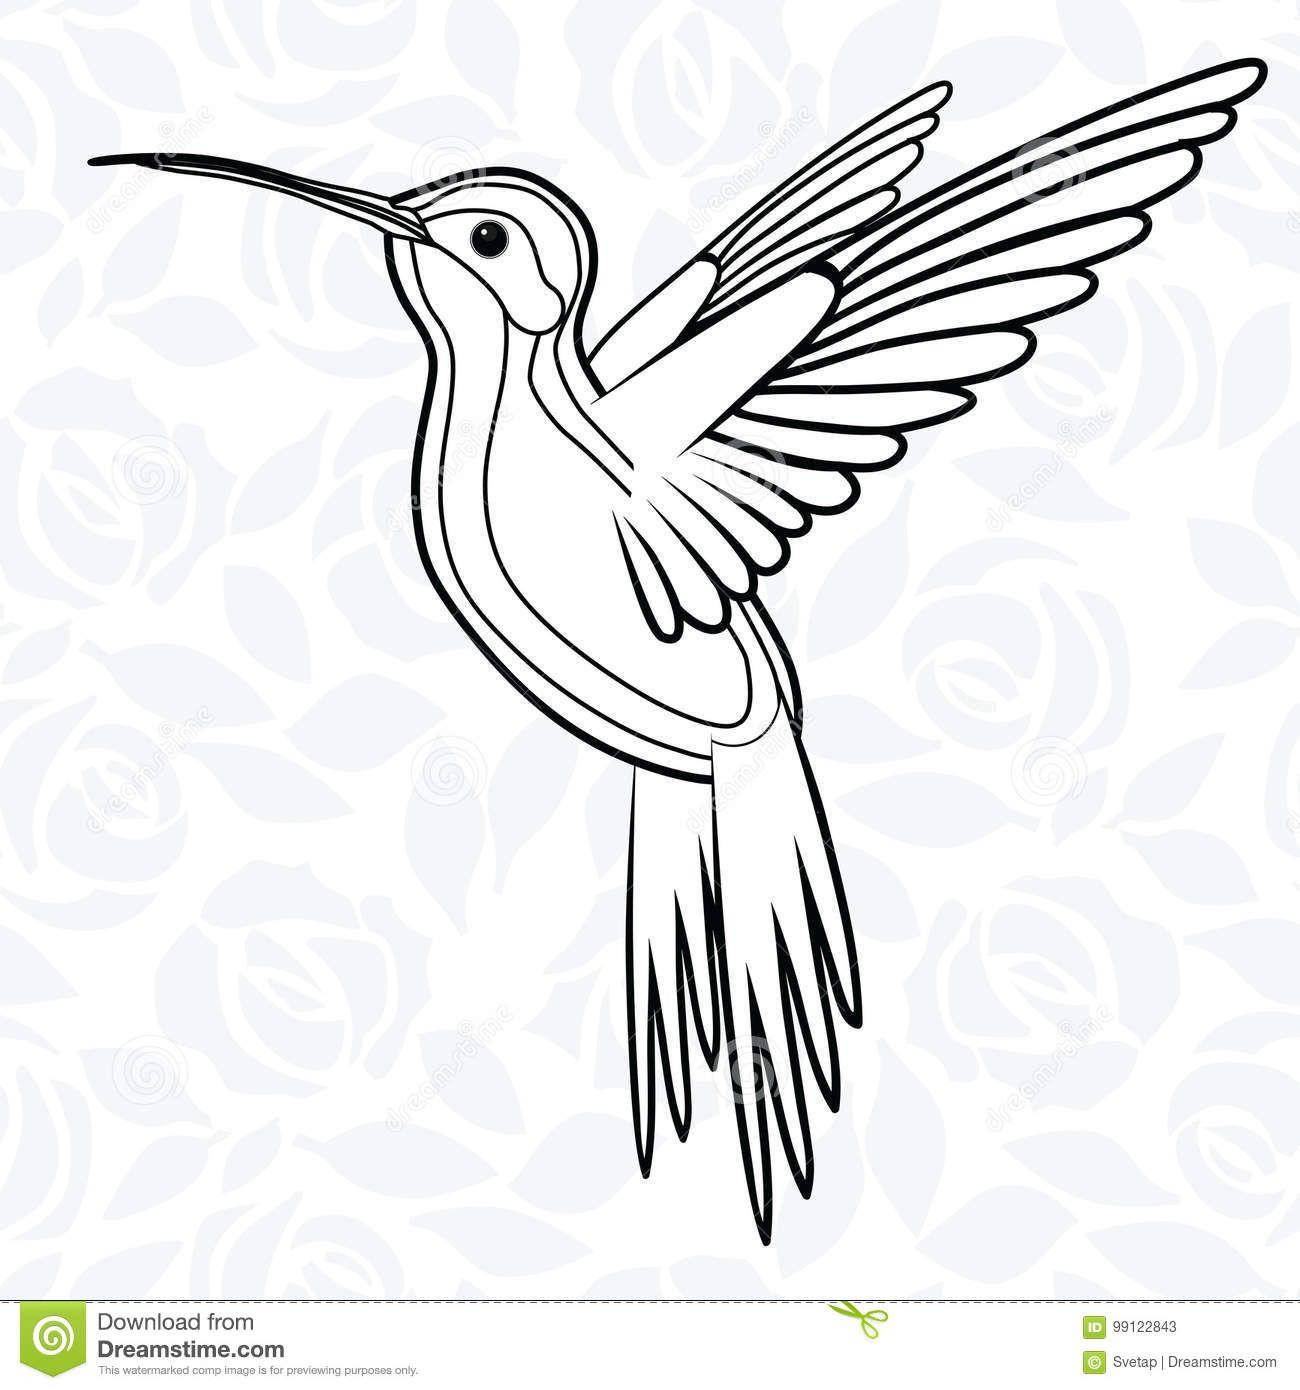 Colibri Or Hummingbirds For Logo, Icon, T-shirt, Mascot, Poster ...